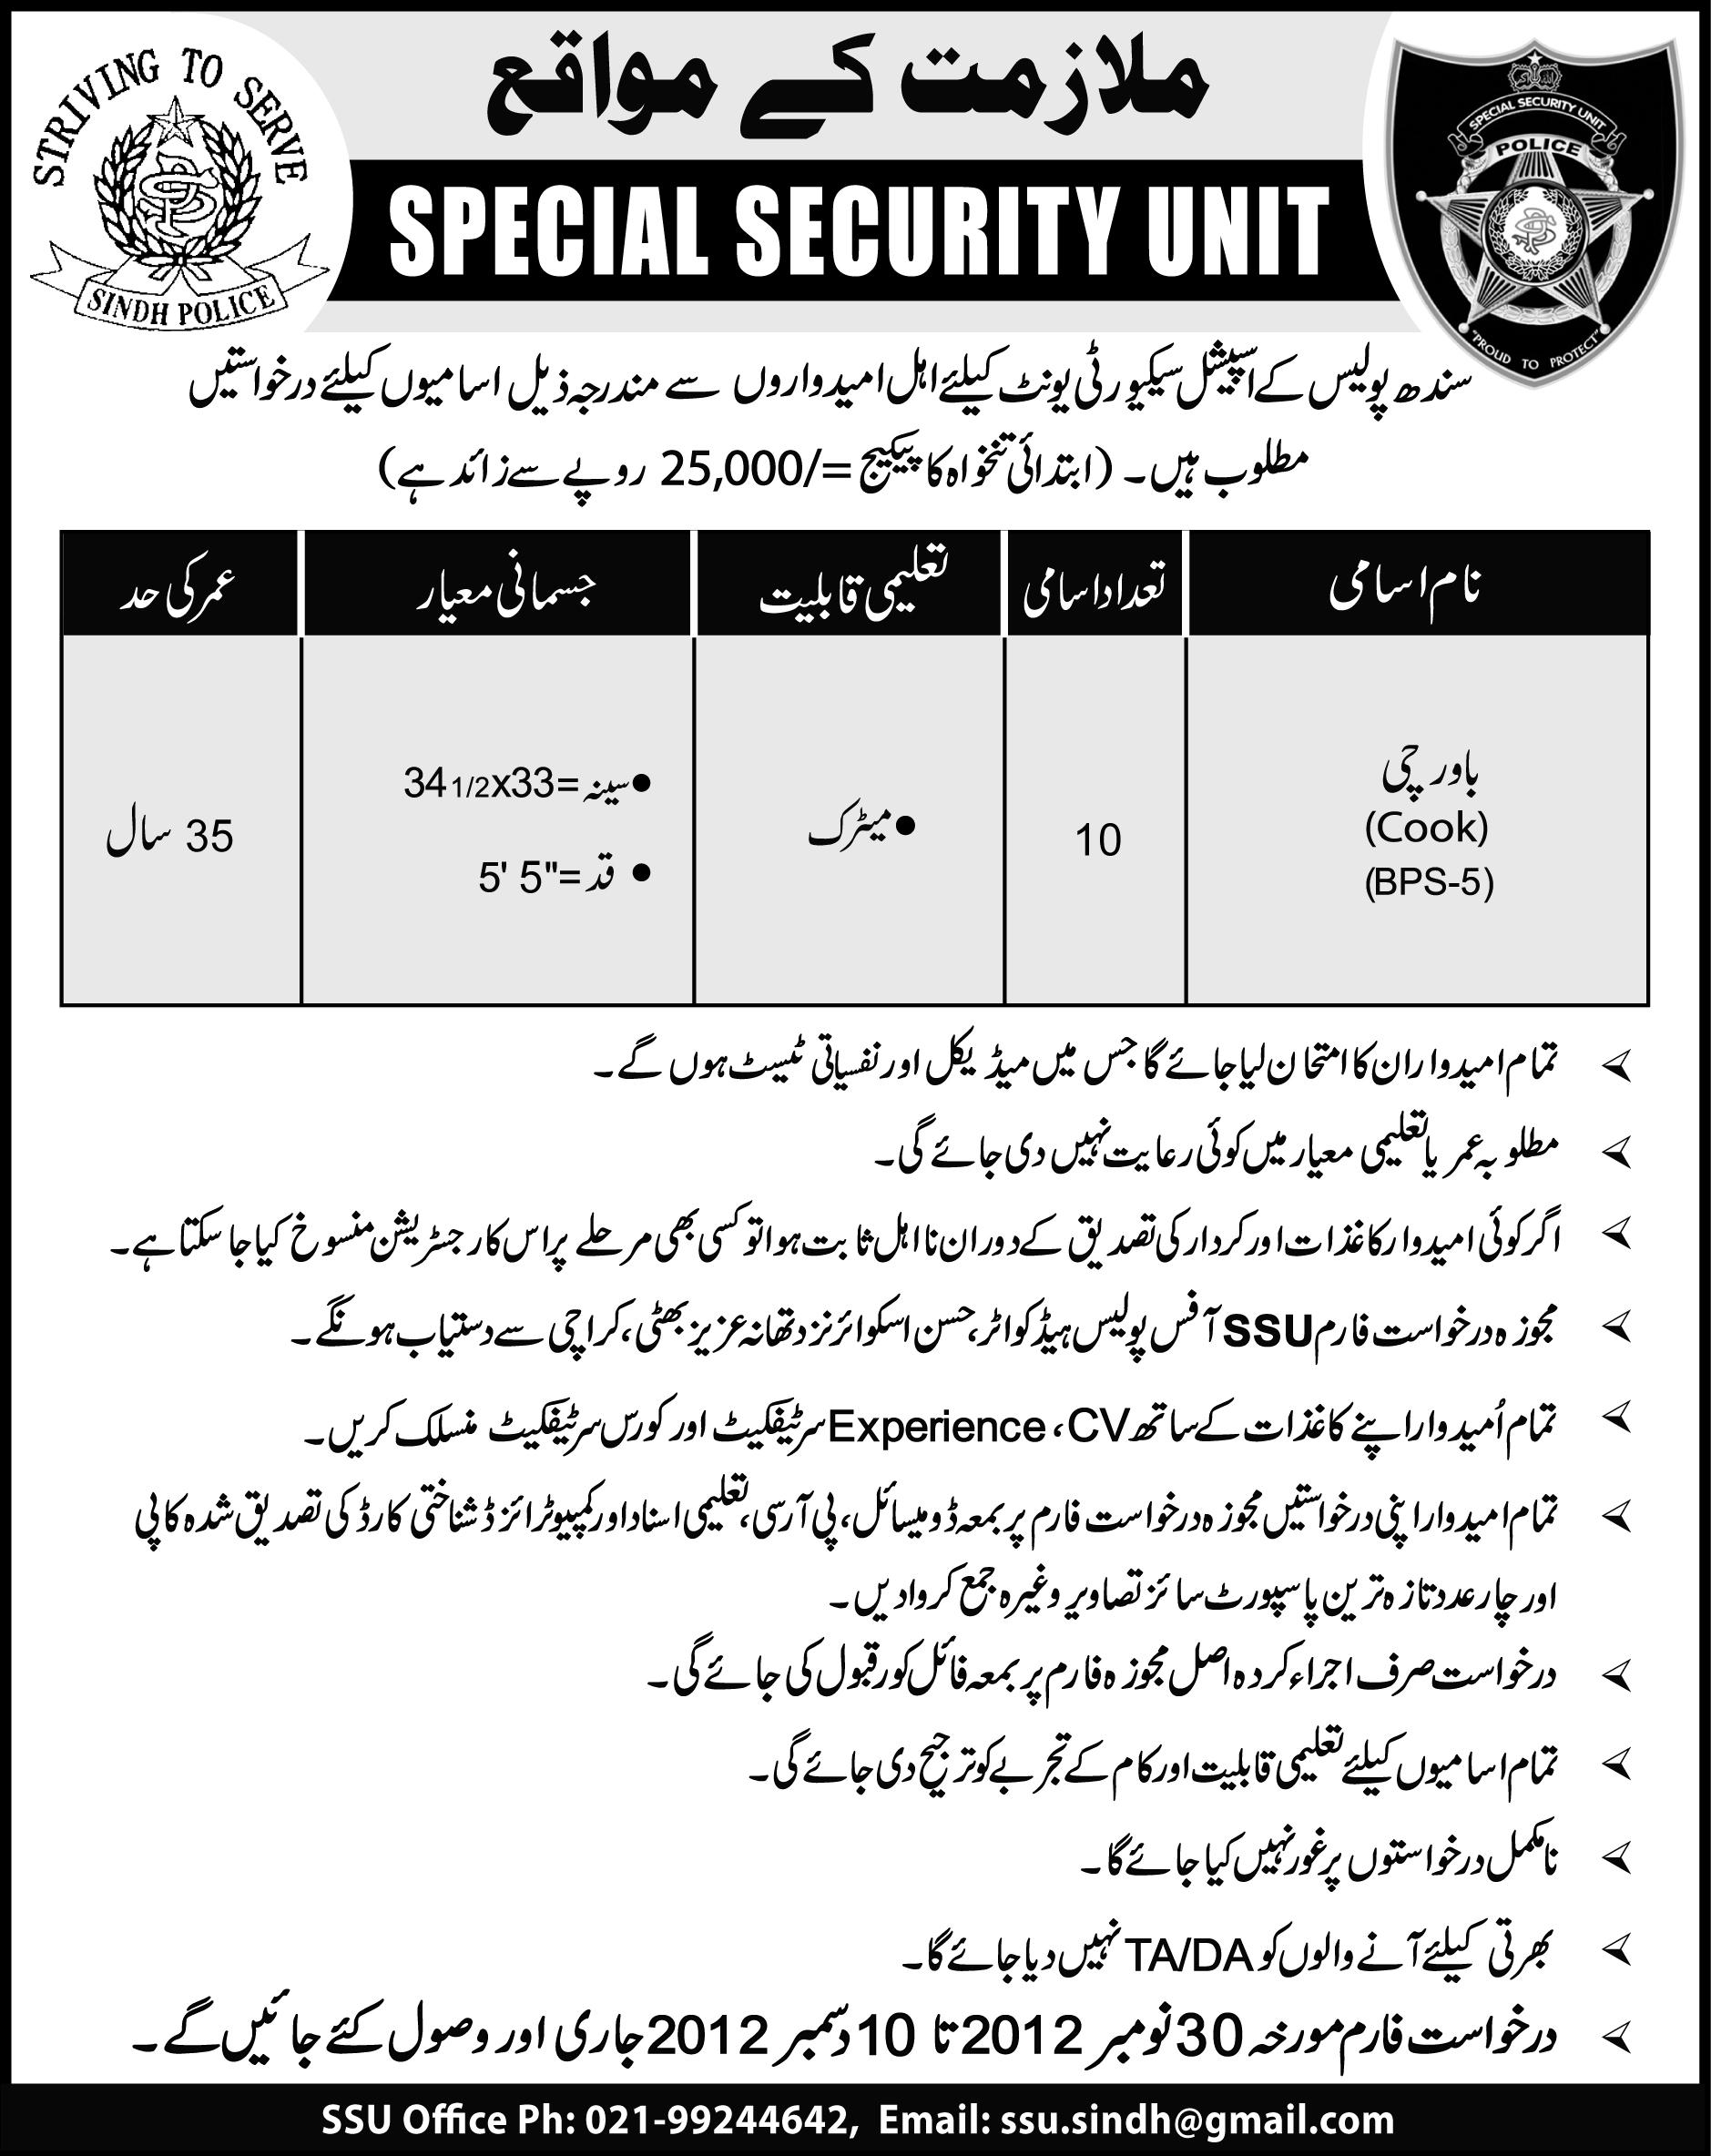 Sindh Police ::